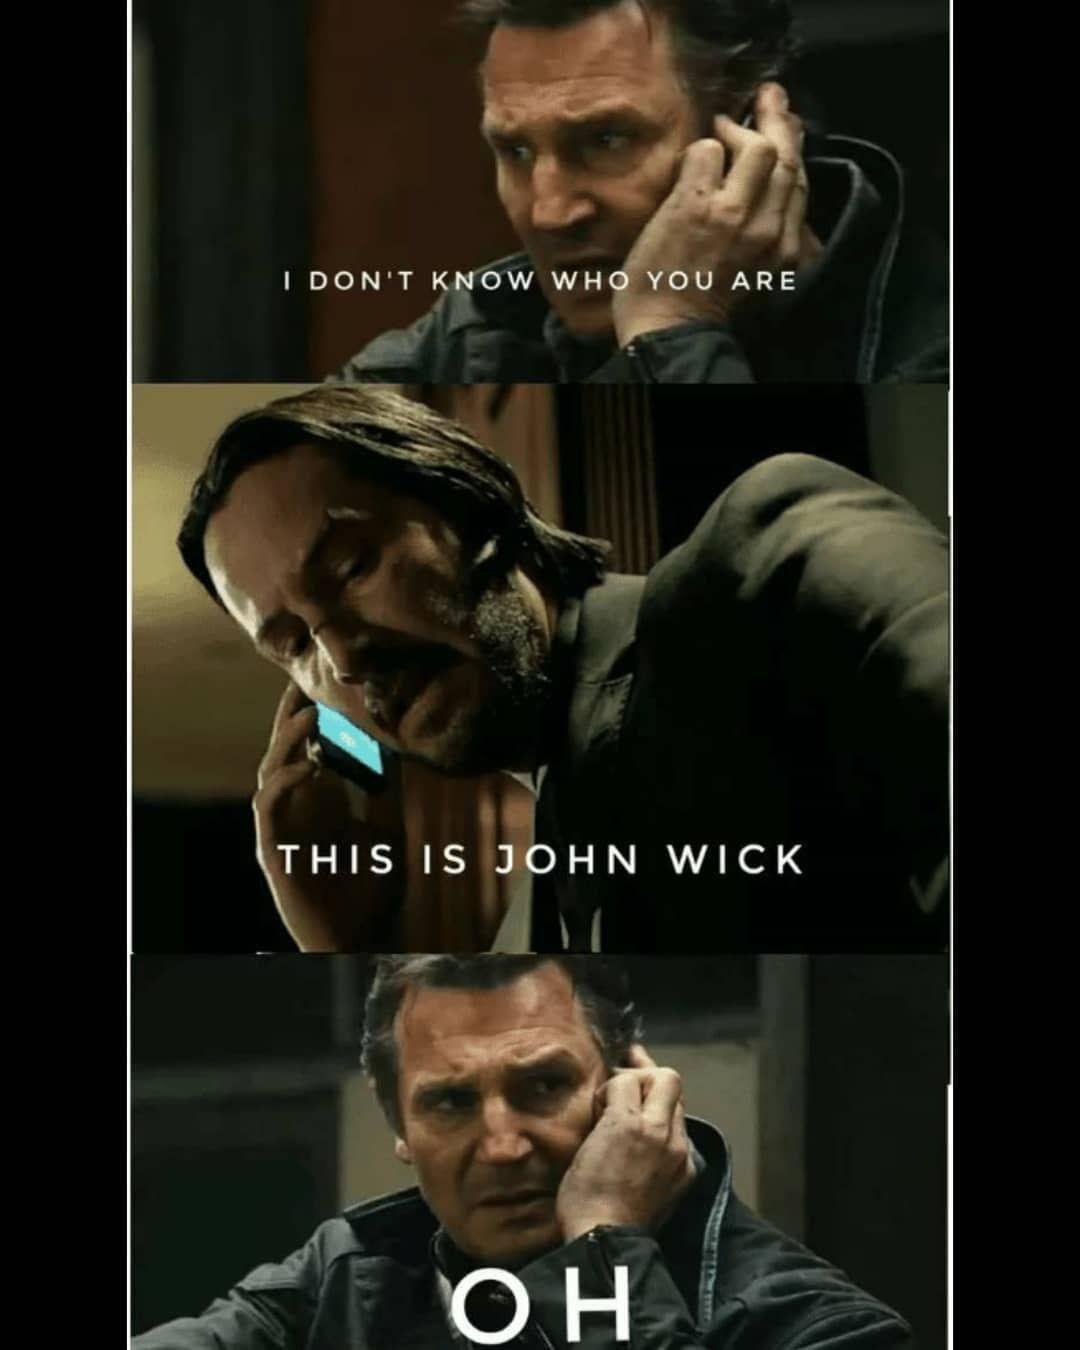 John Wick, Taken